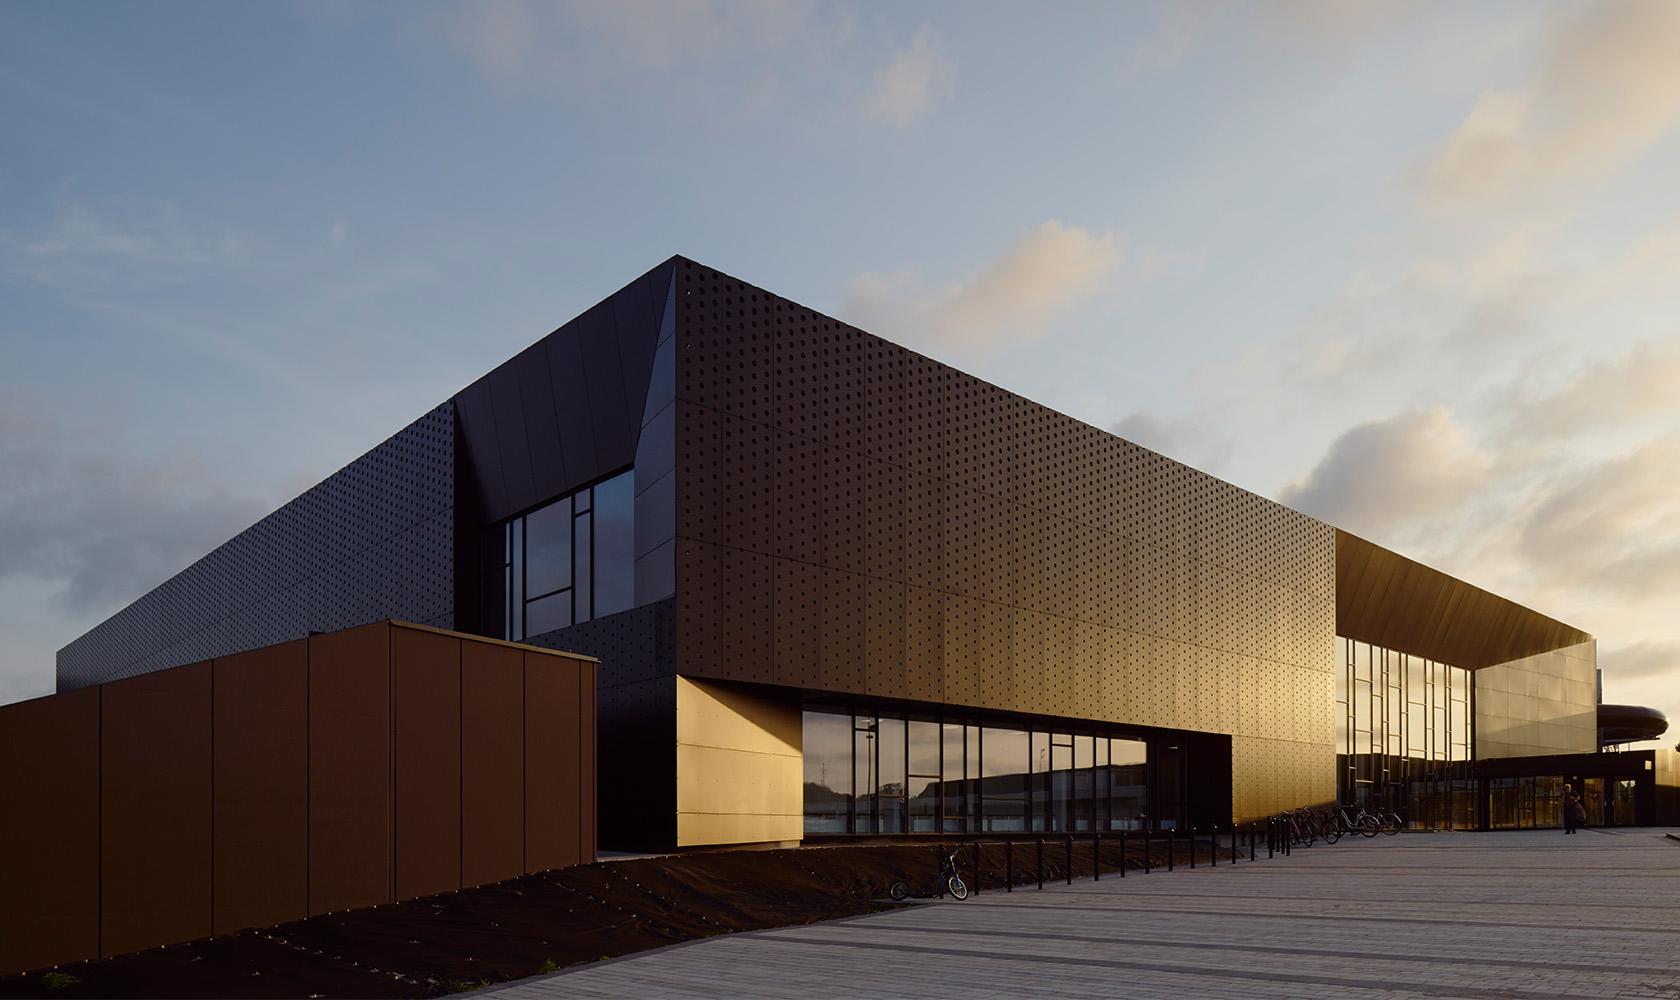 Ystad Arena